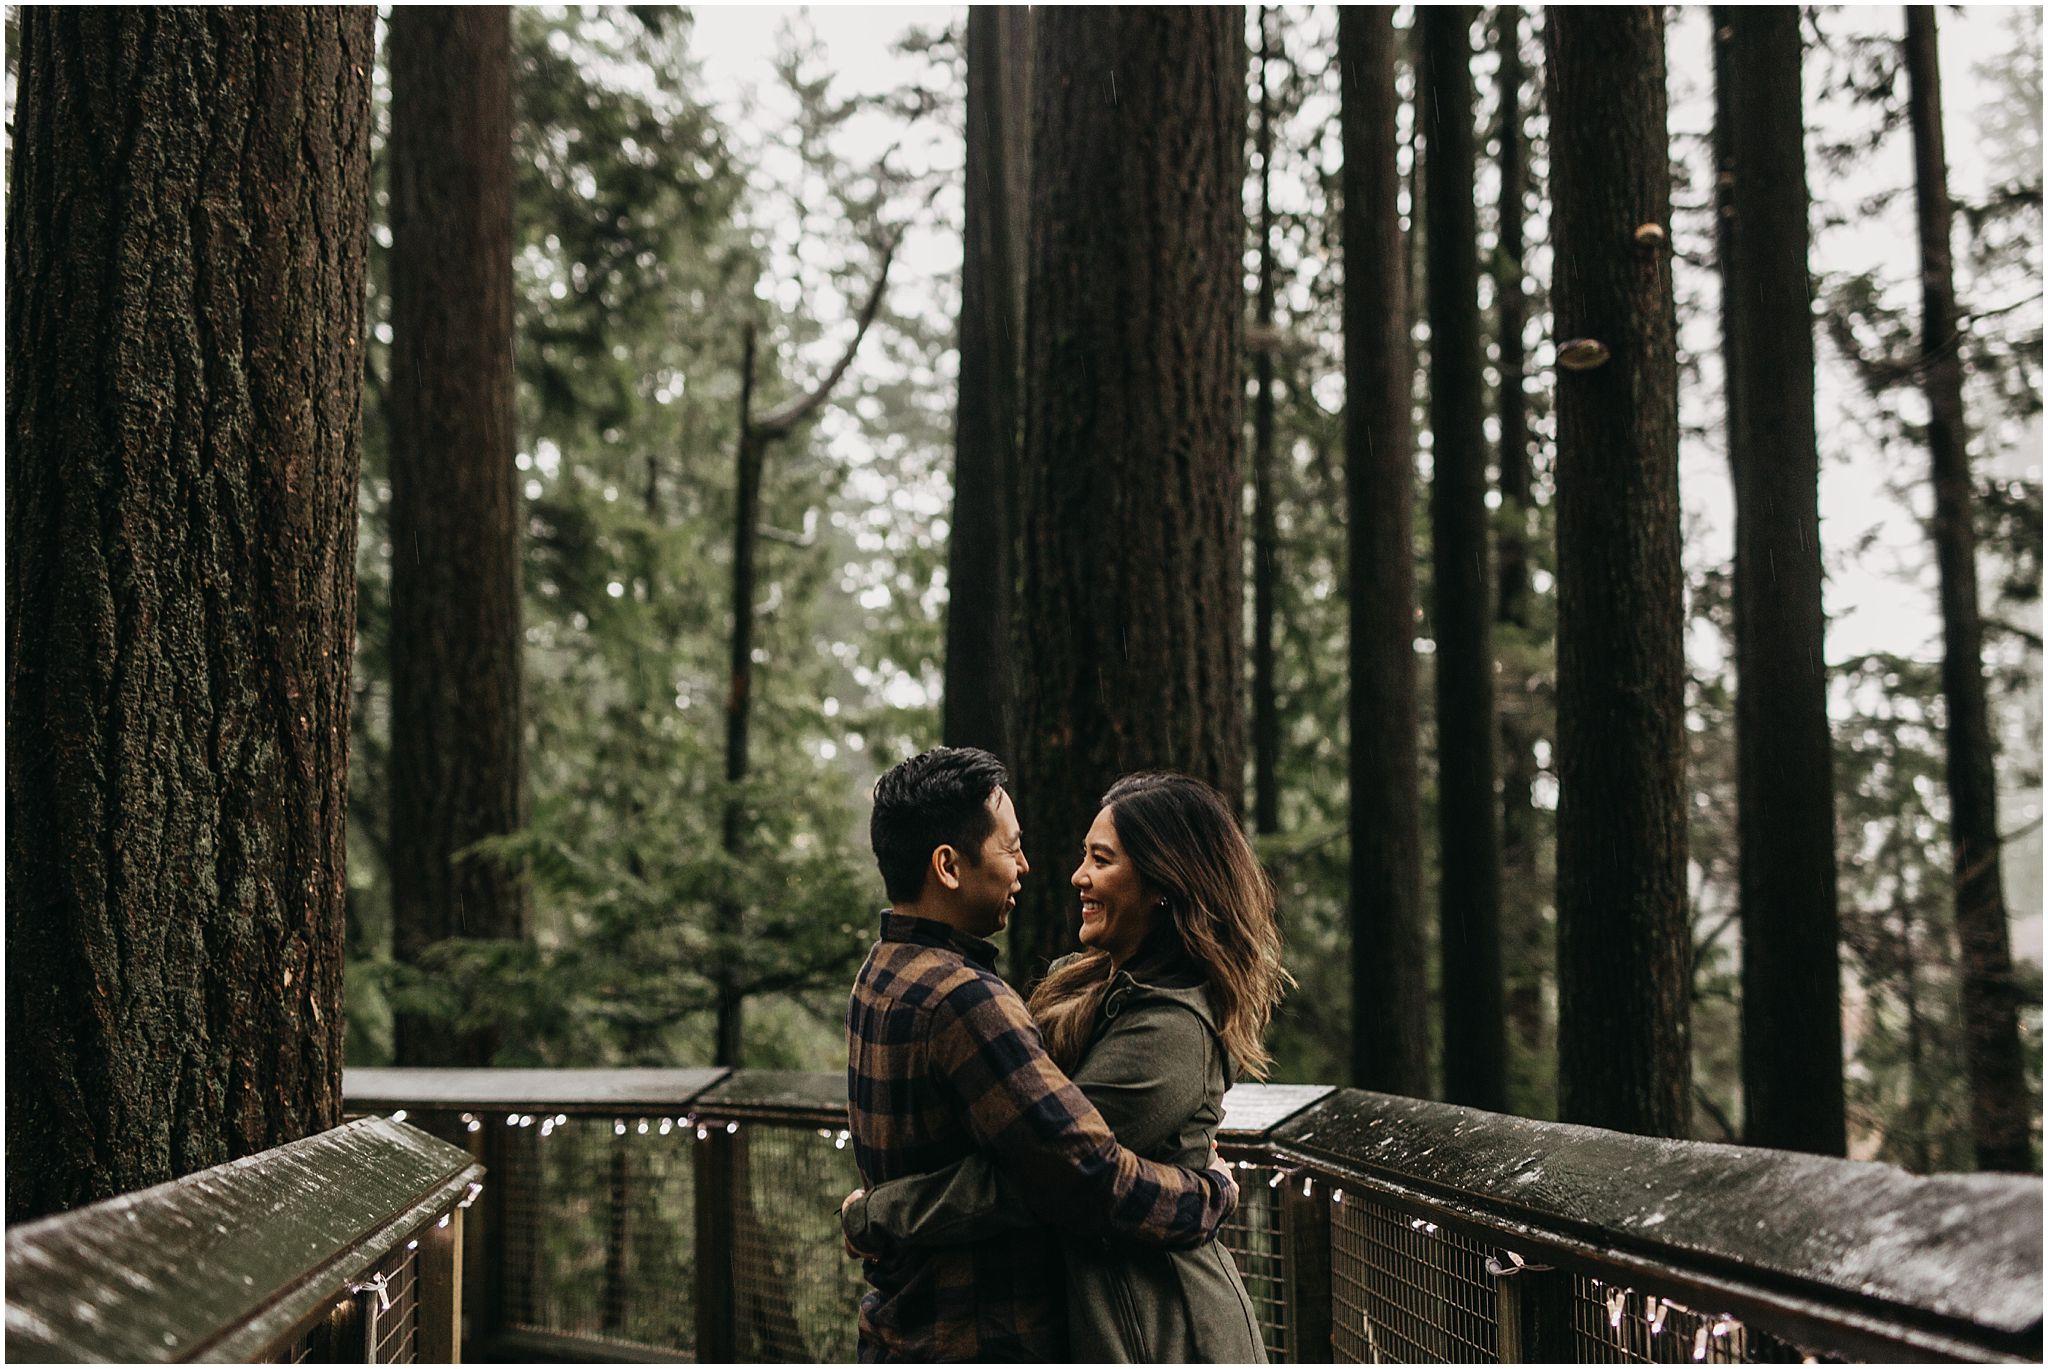 engaged couple capilano suspension bridge nature walk trees